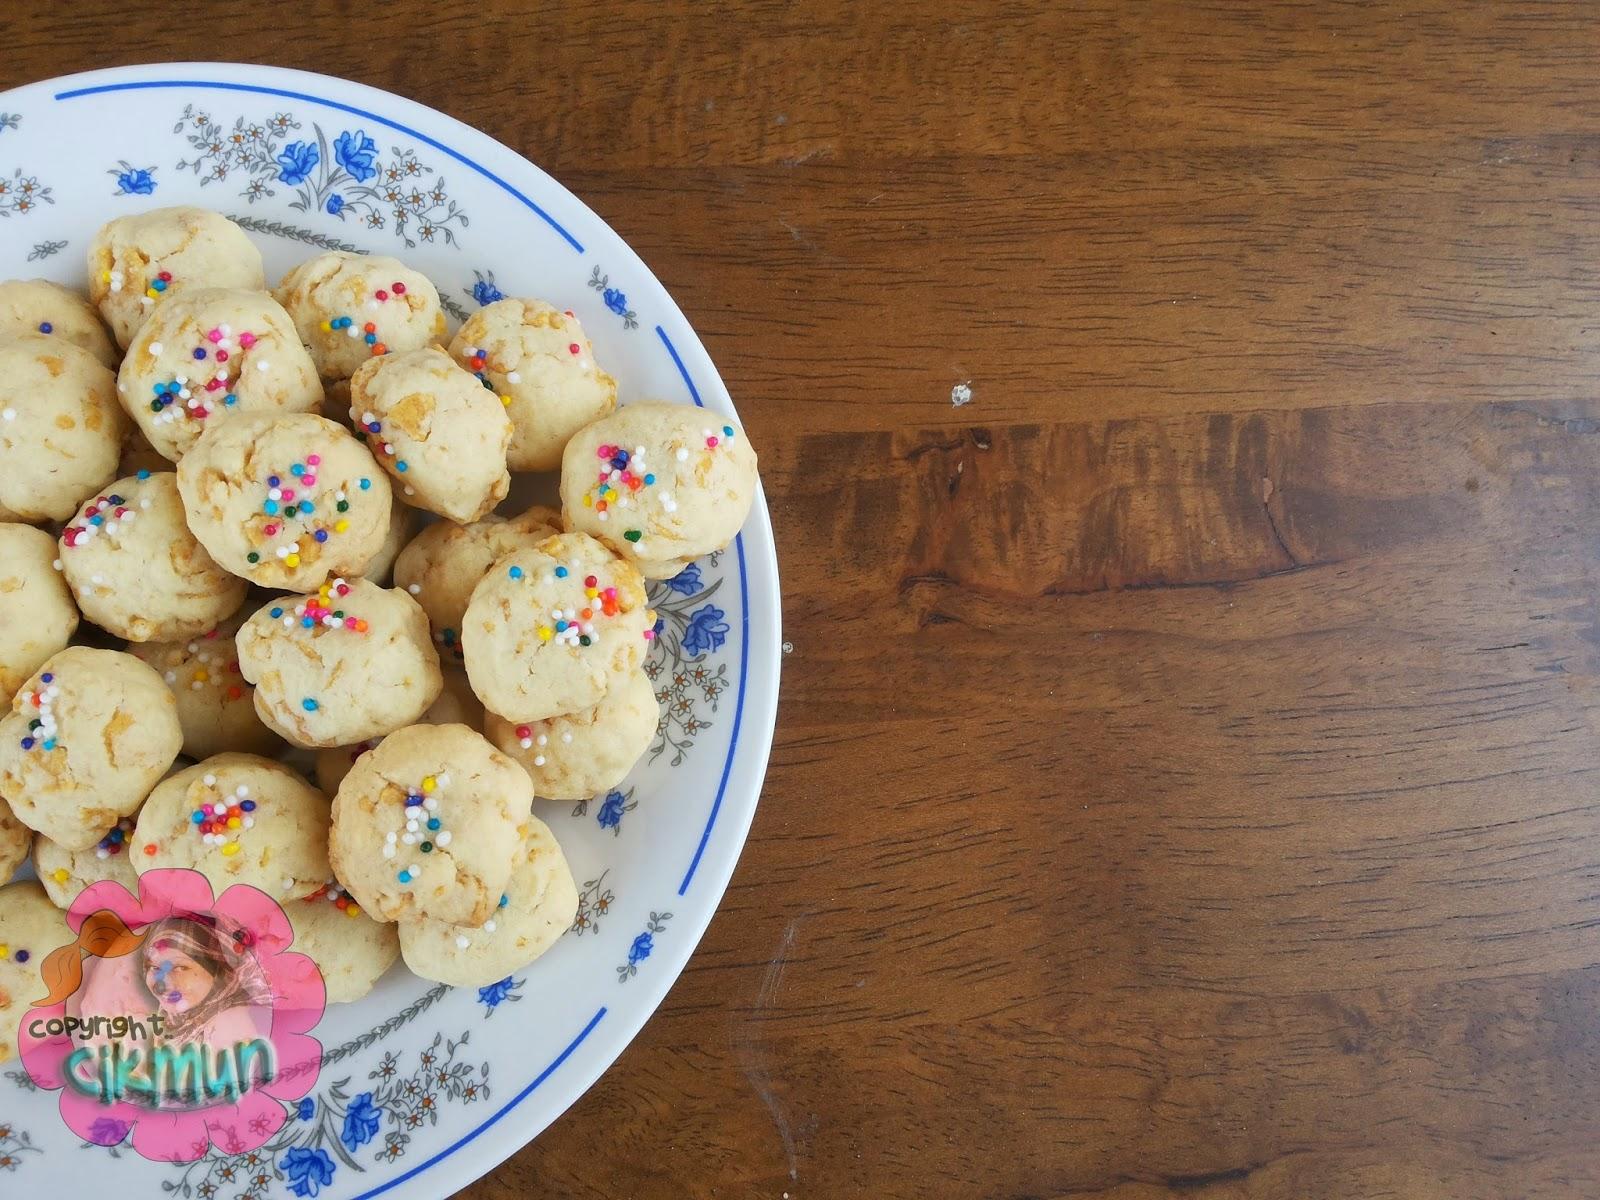 resepi biskut almond london mudah surasmi Resepi Biskut Sarang Semut Azlina Ina Enak dan Mudah